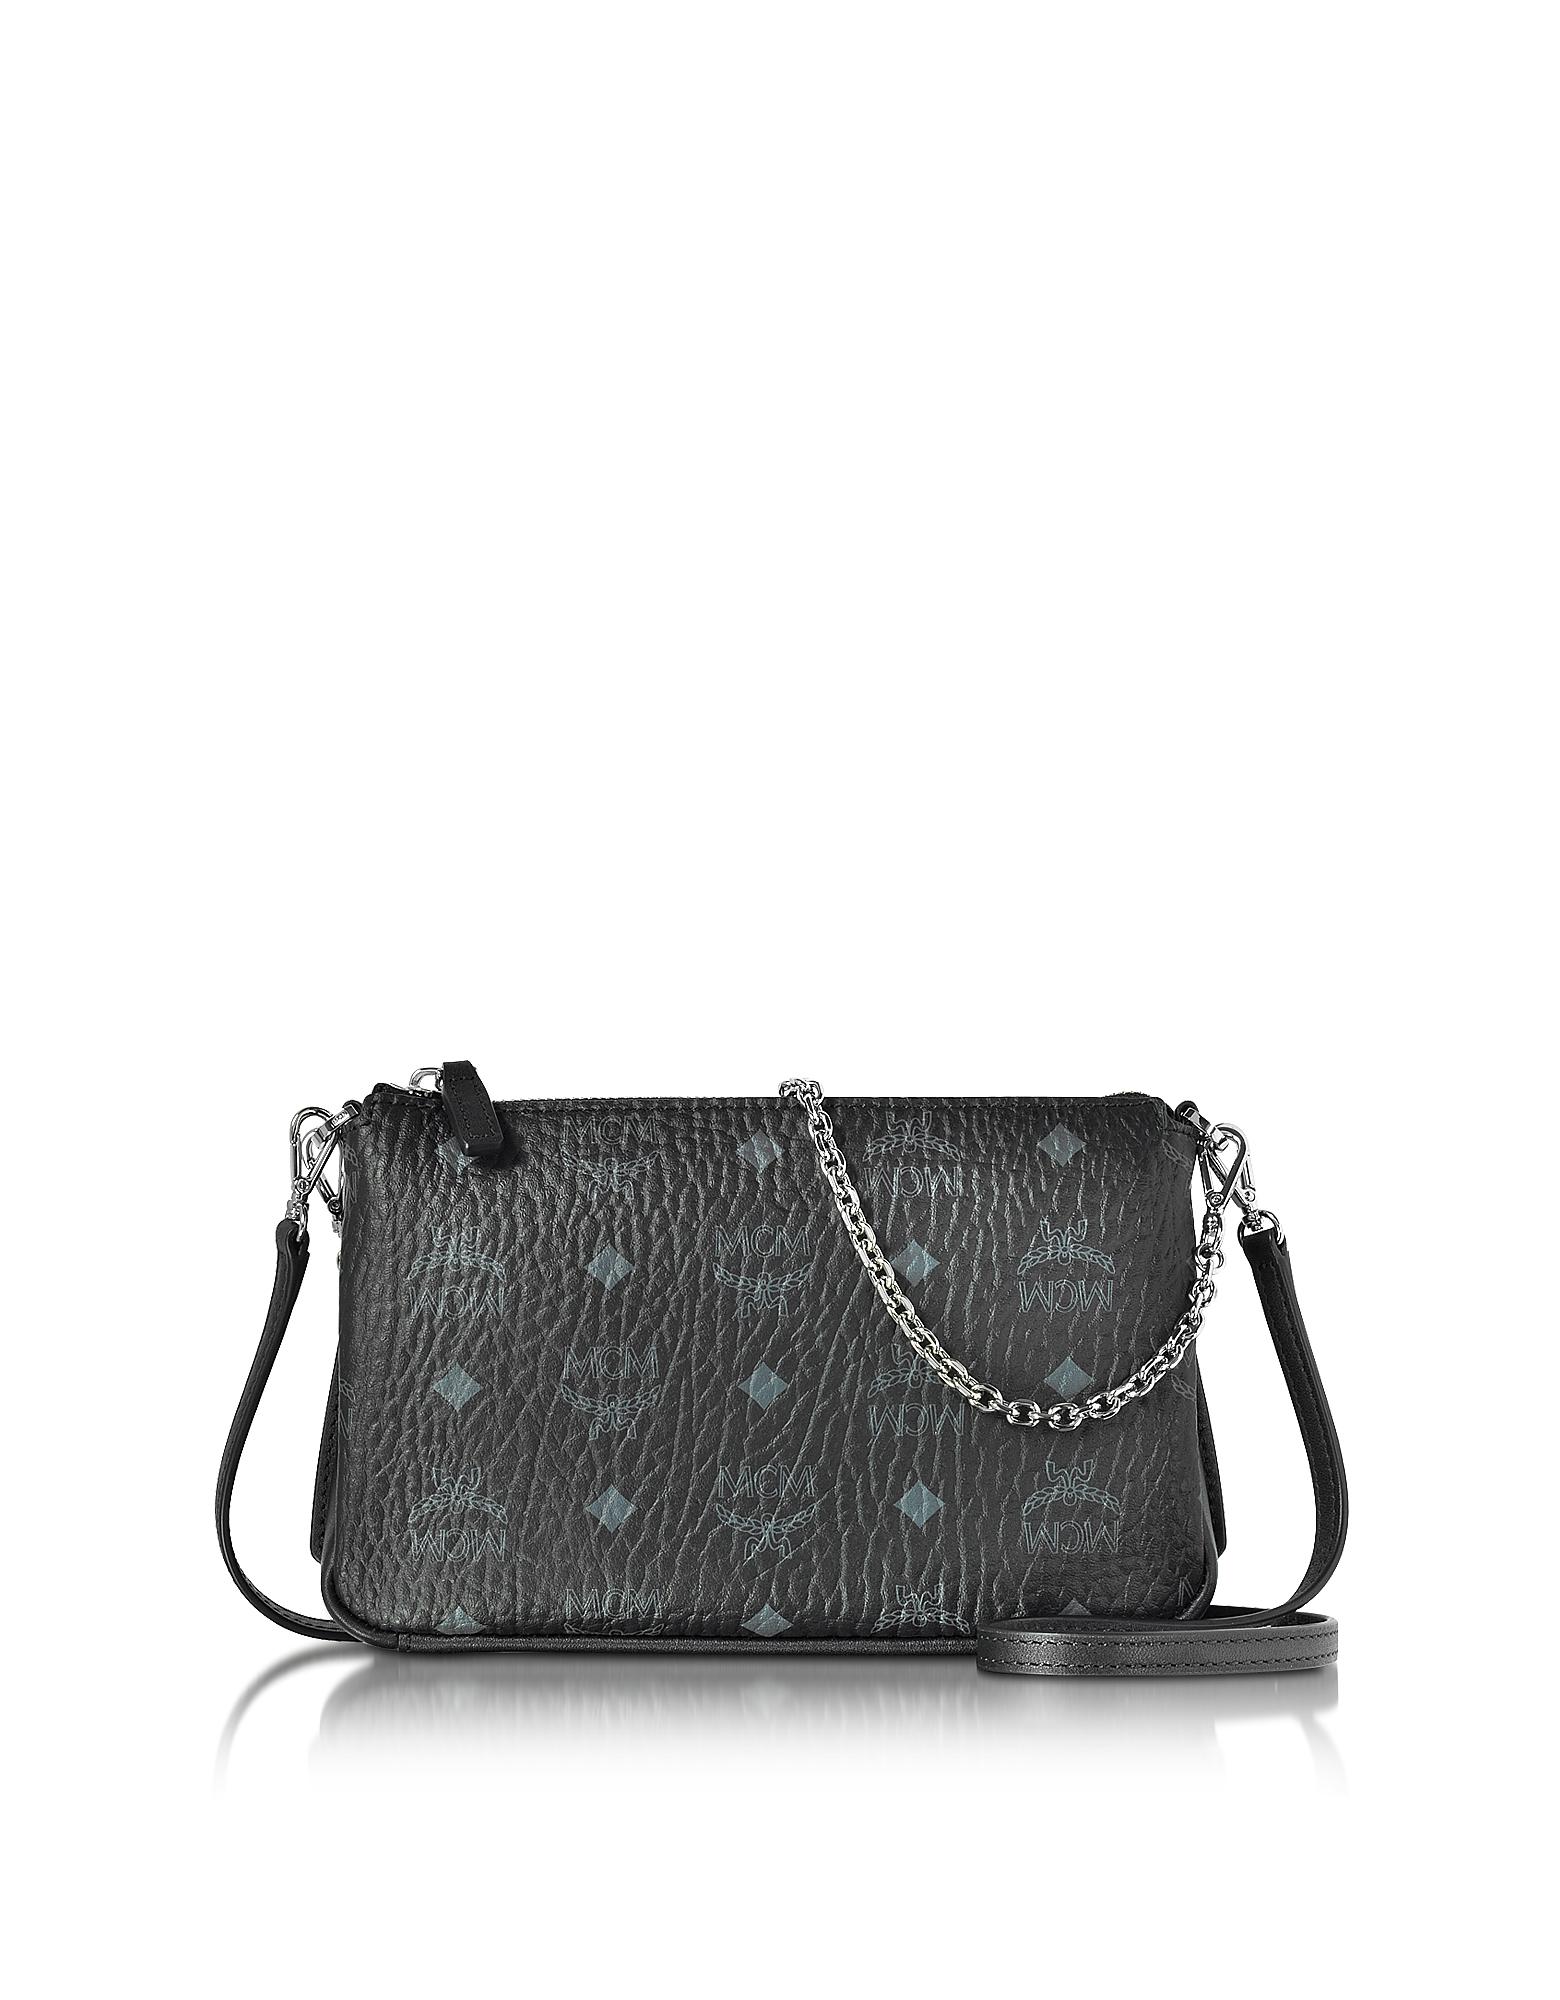 MCM Handbags, Millie Visetos Black Medium Zip Crossbody Bag